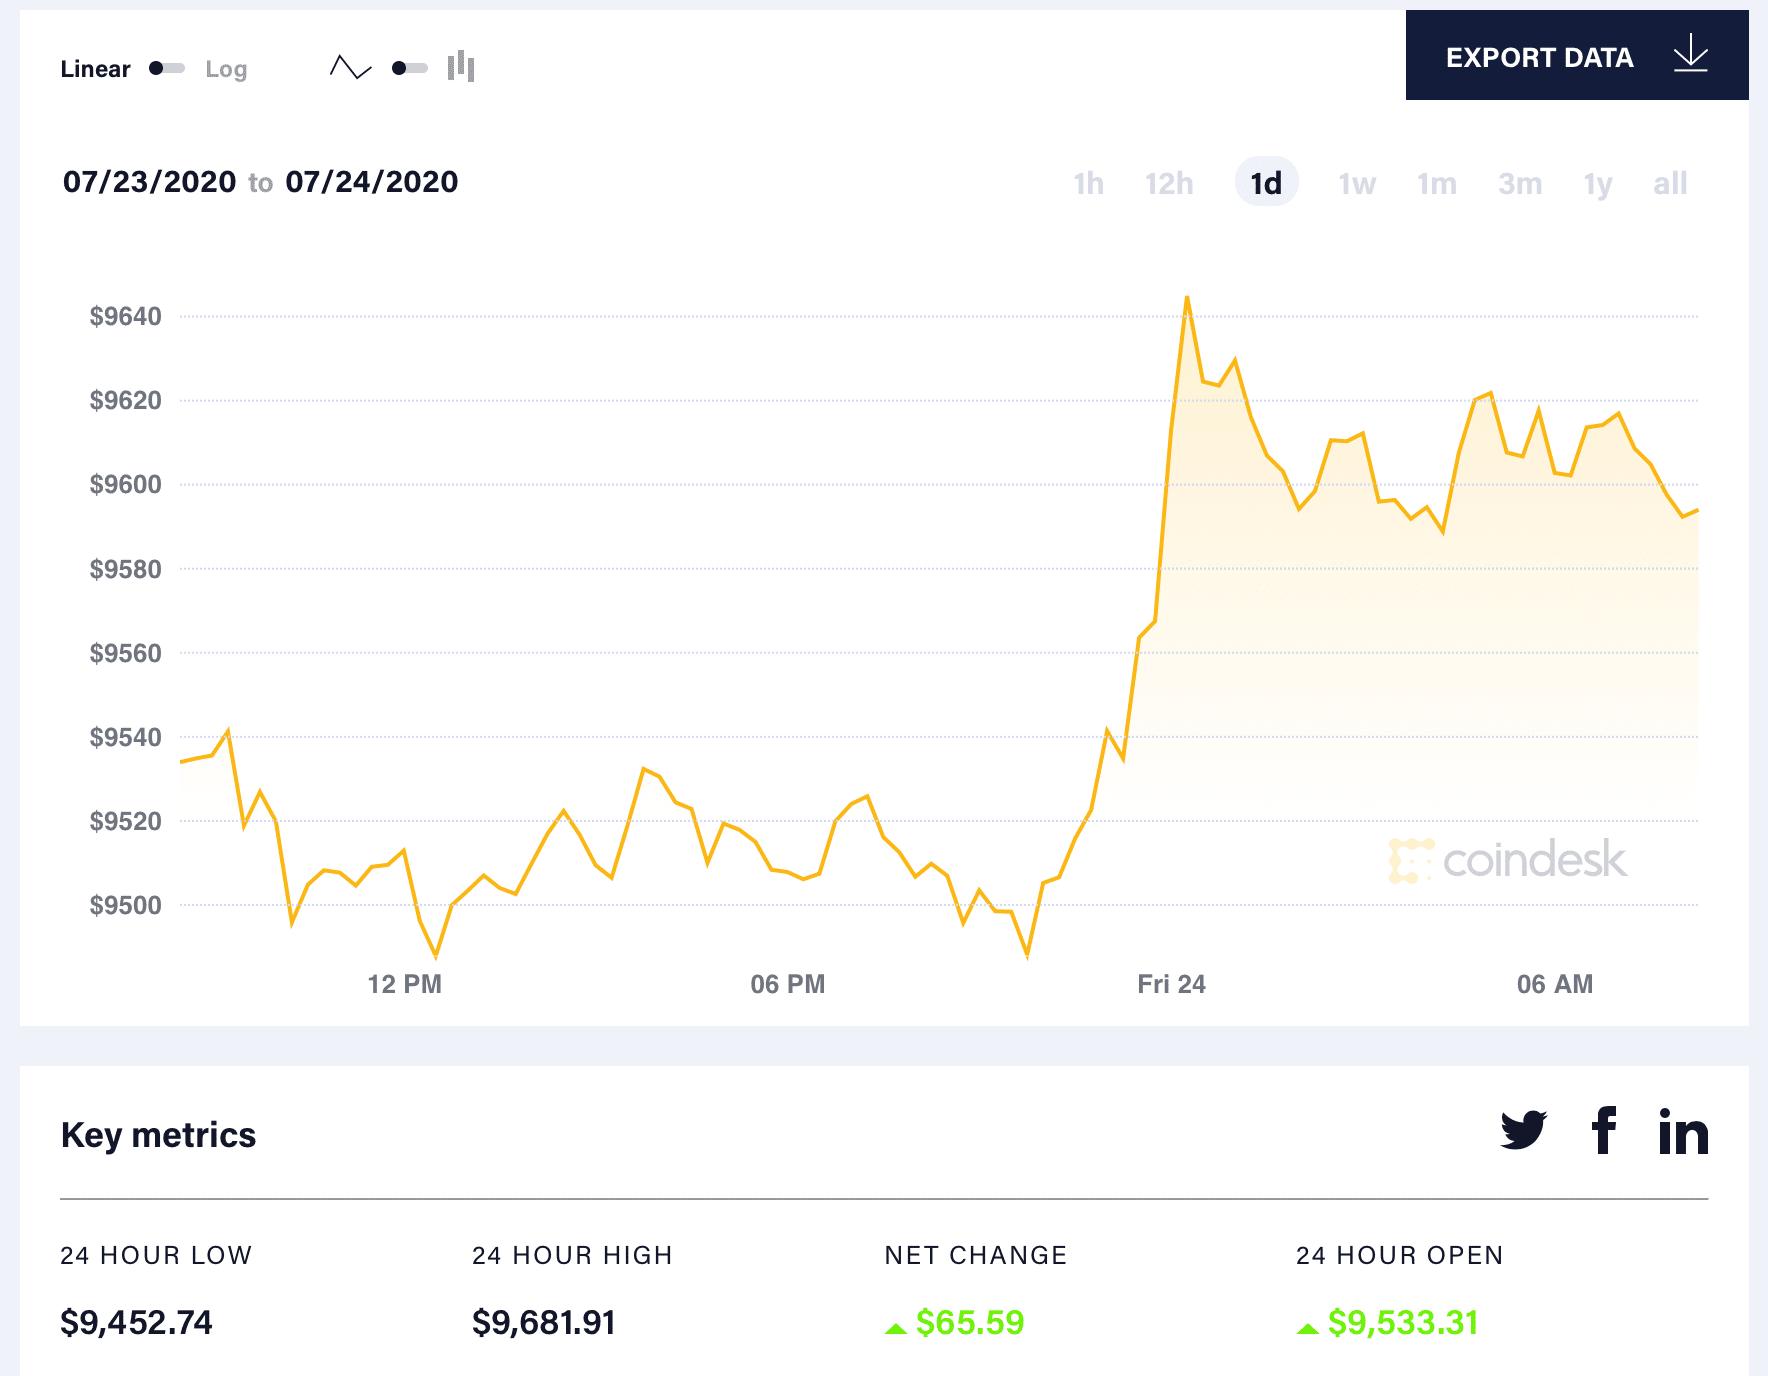 lamento no invertir bitcoin convertirse en un gran comerciante de cifrado